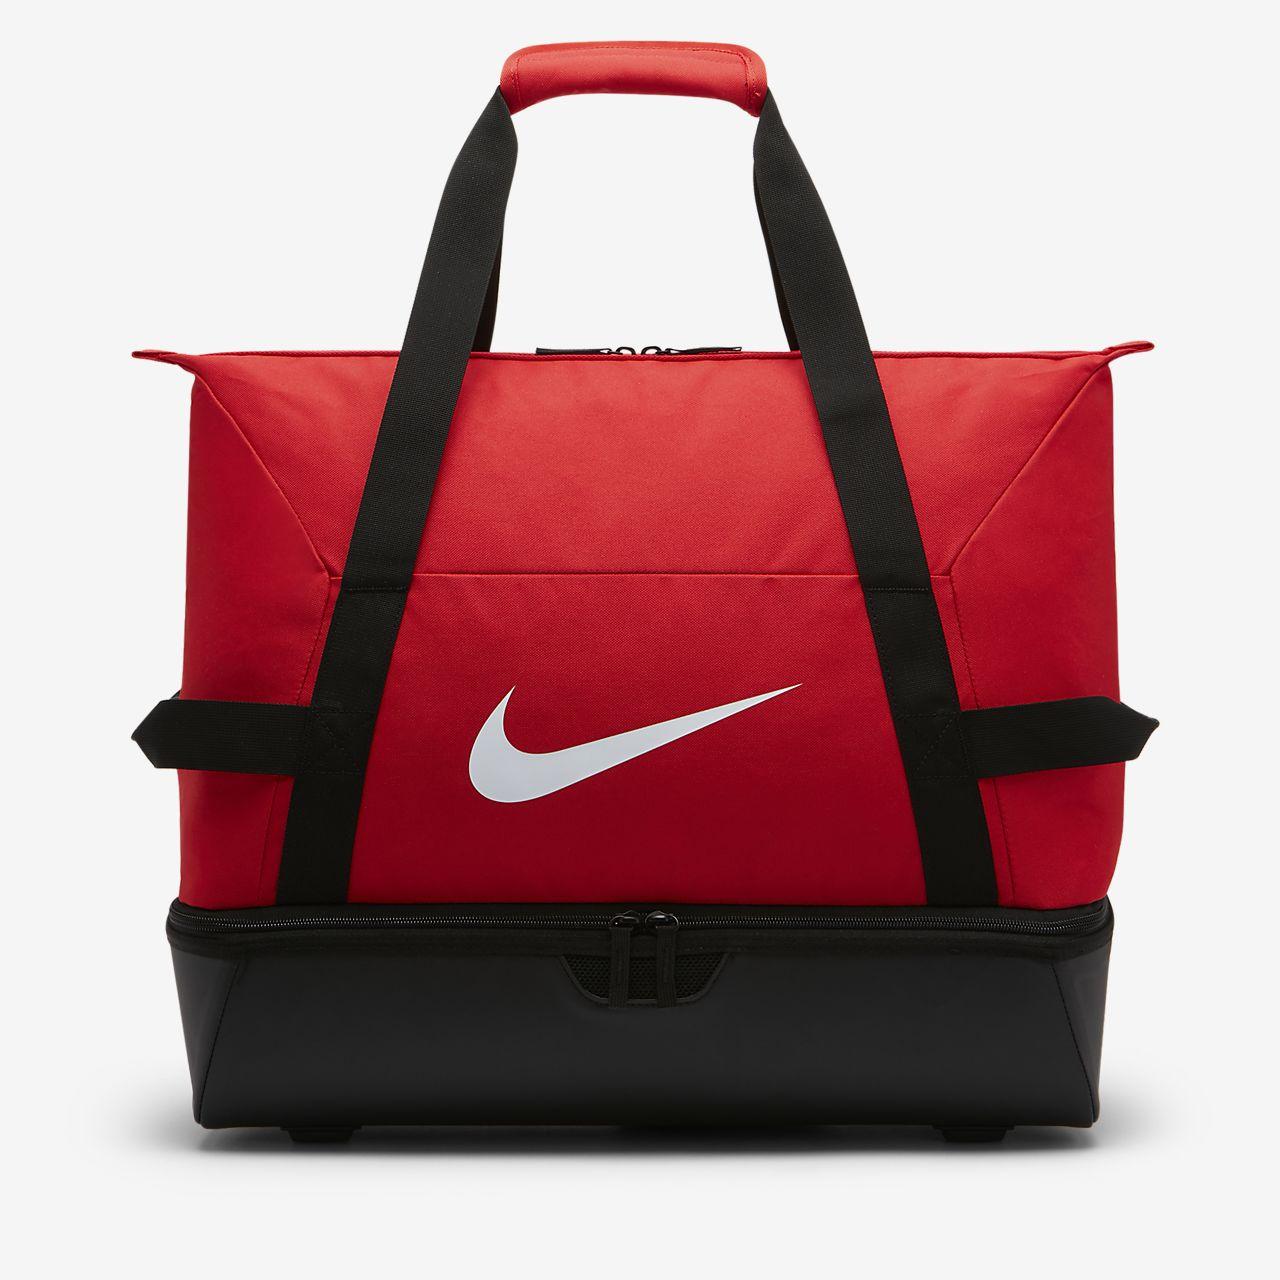 5d79b47fb1c Nike Academy Team Hardcase (Large) Football Duffel Bag. Nike.com CA